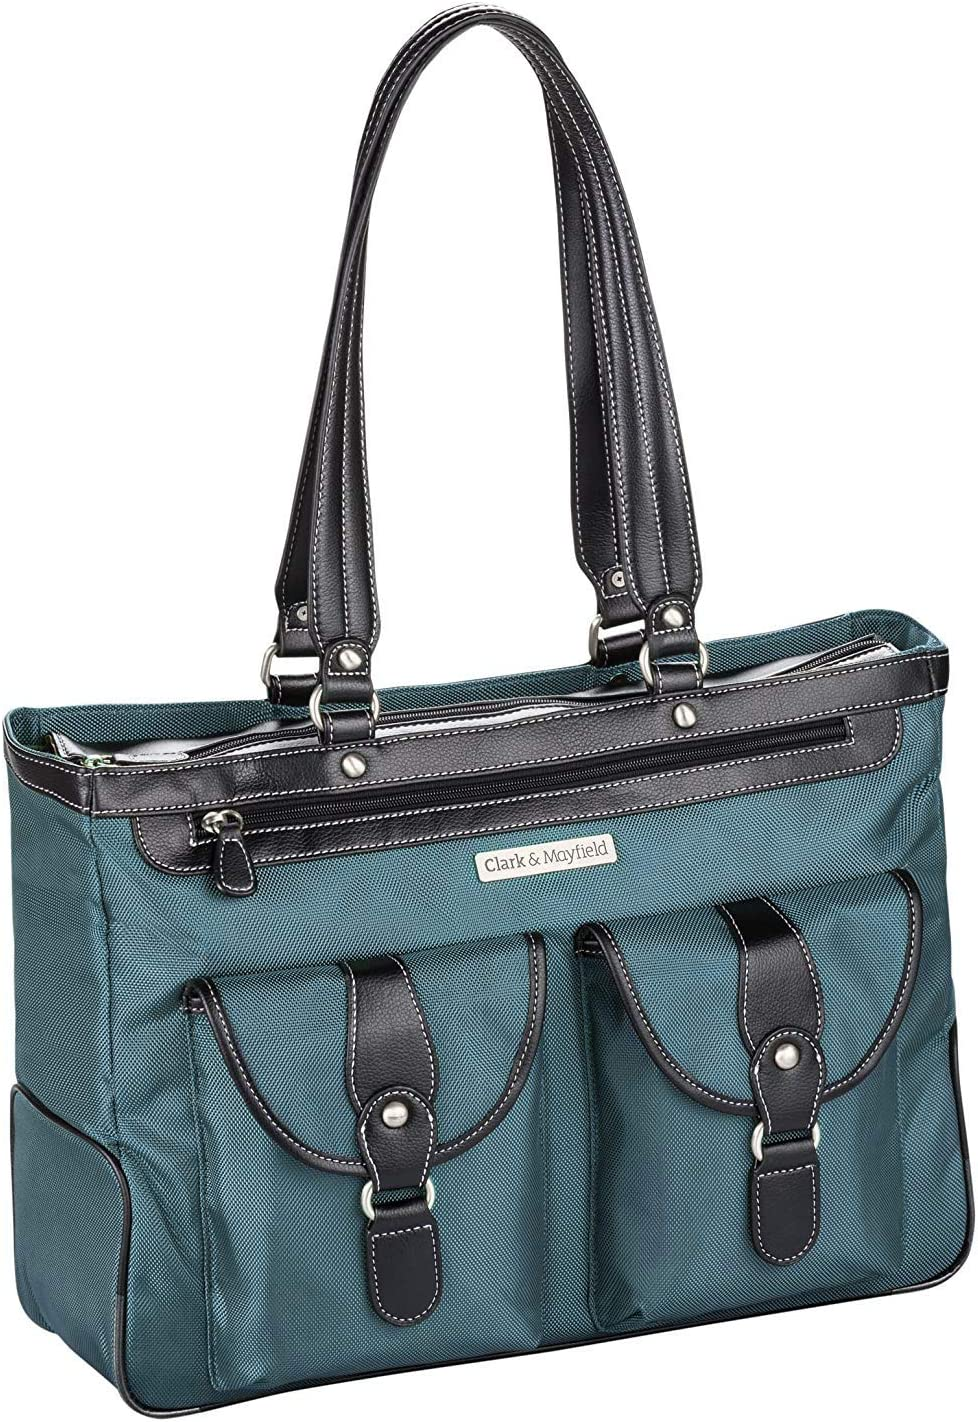 "Clark & Mayfield Marquam Metro Laptop Handbag 18.4"" (Deep Teal)"